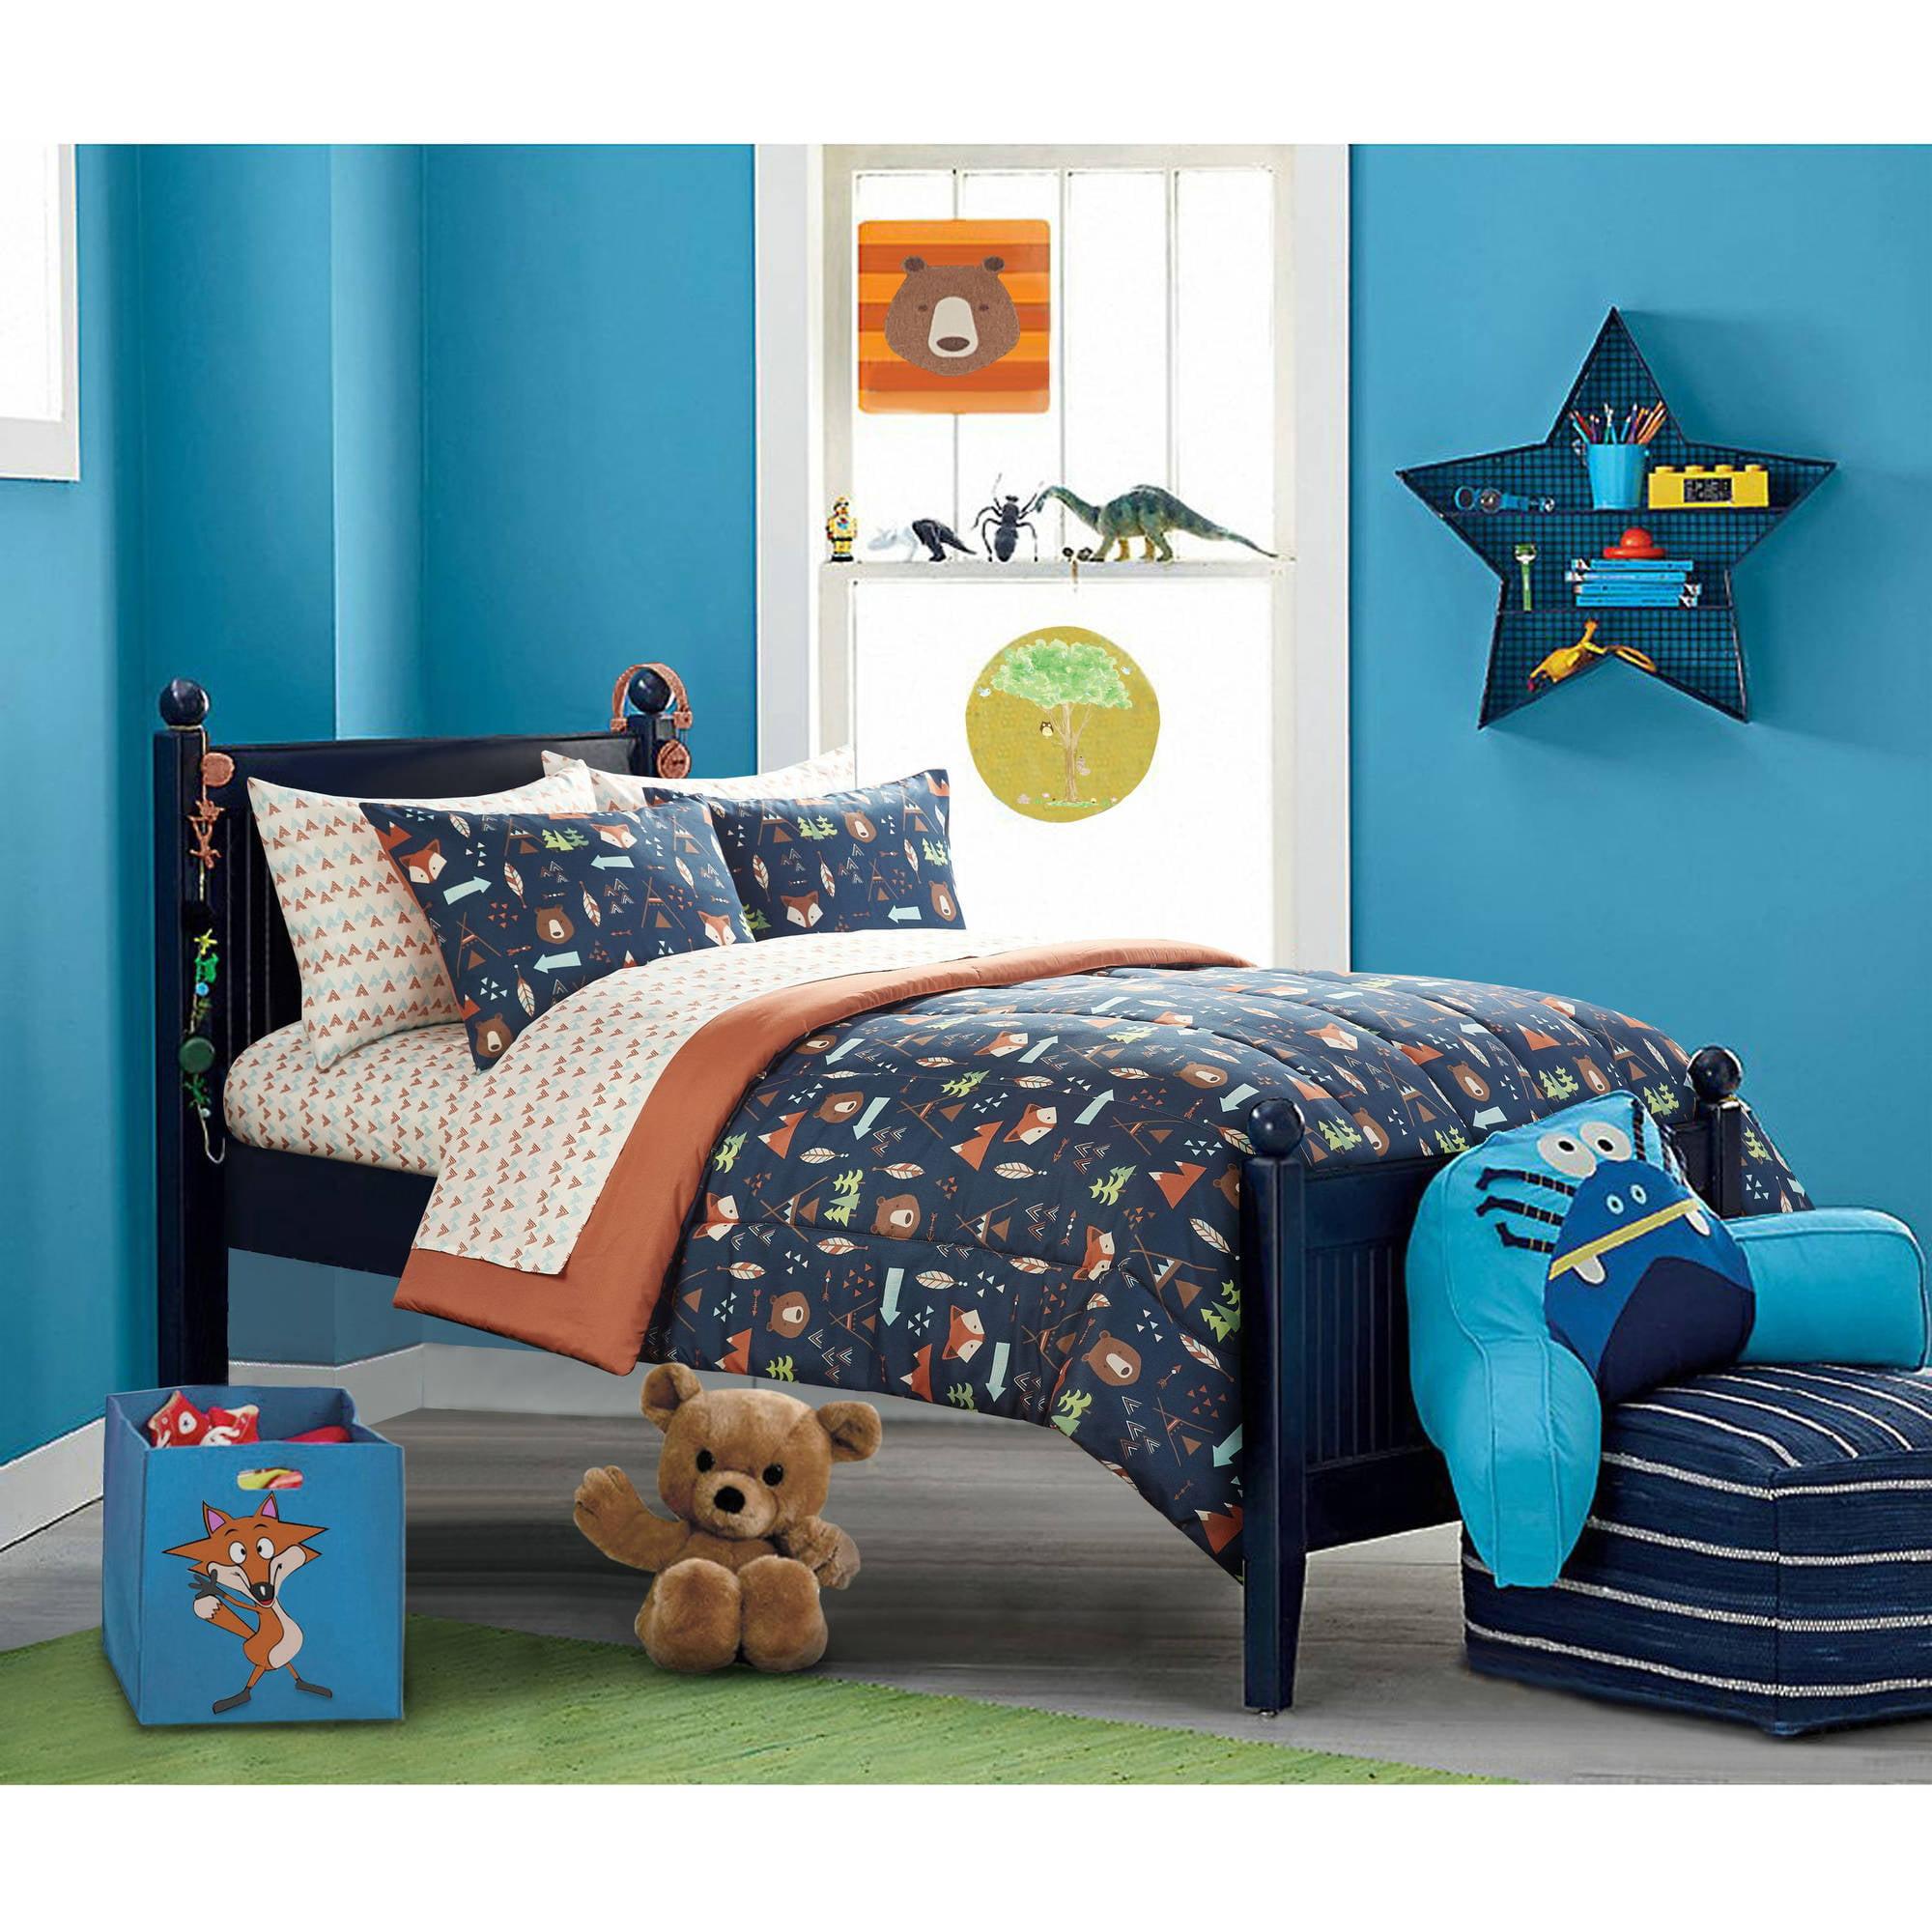 Mainstays Kids Woodland Safari Boy Bed in a Bag Bedding Set by Idea Nuova